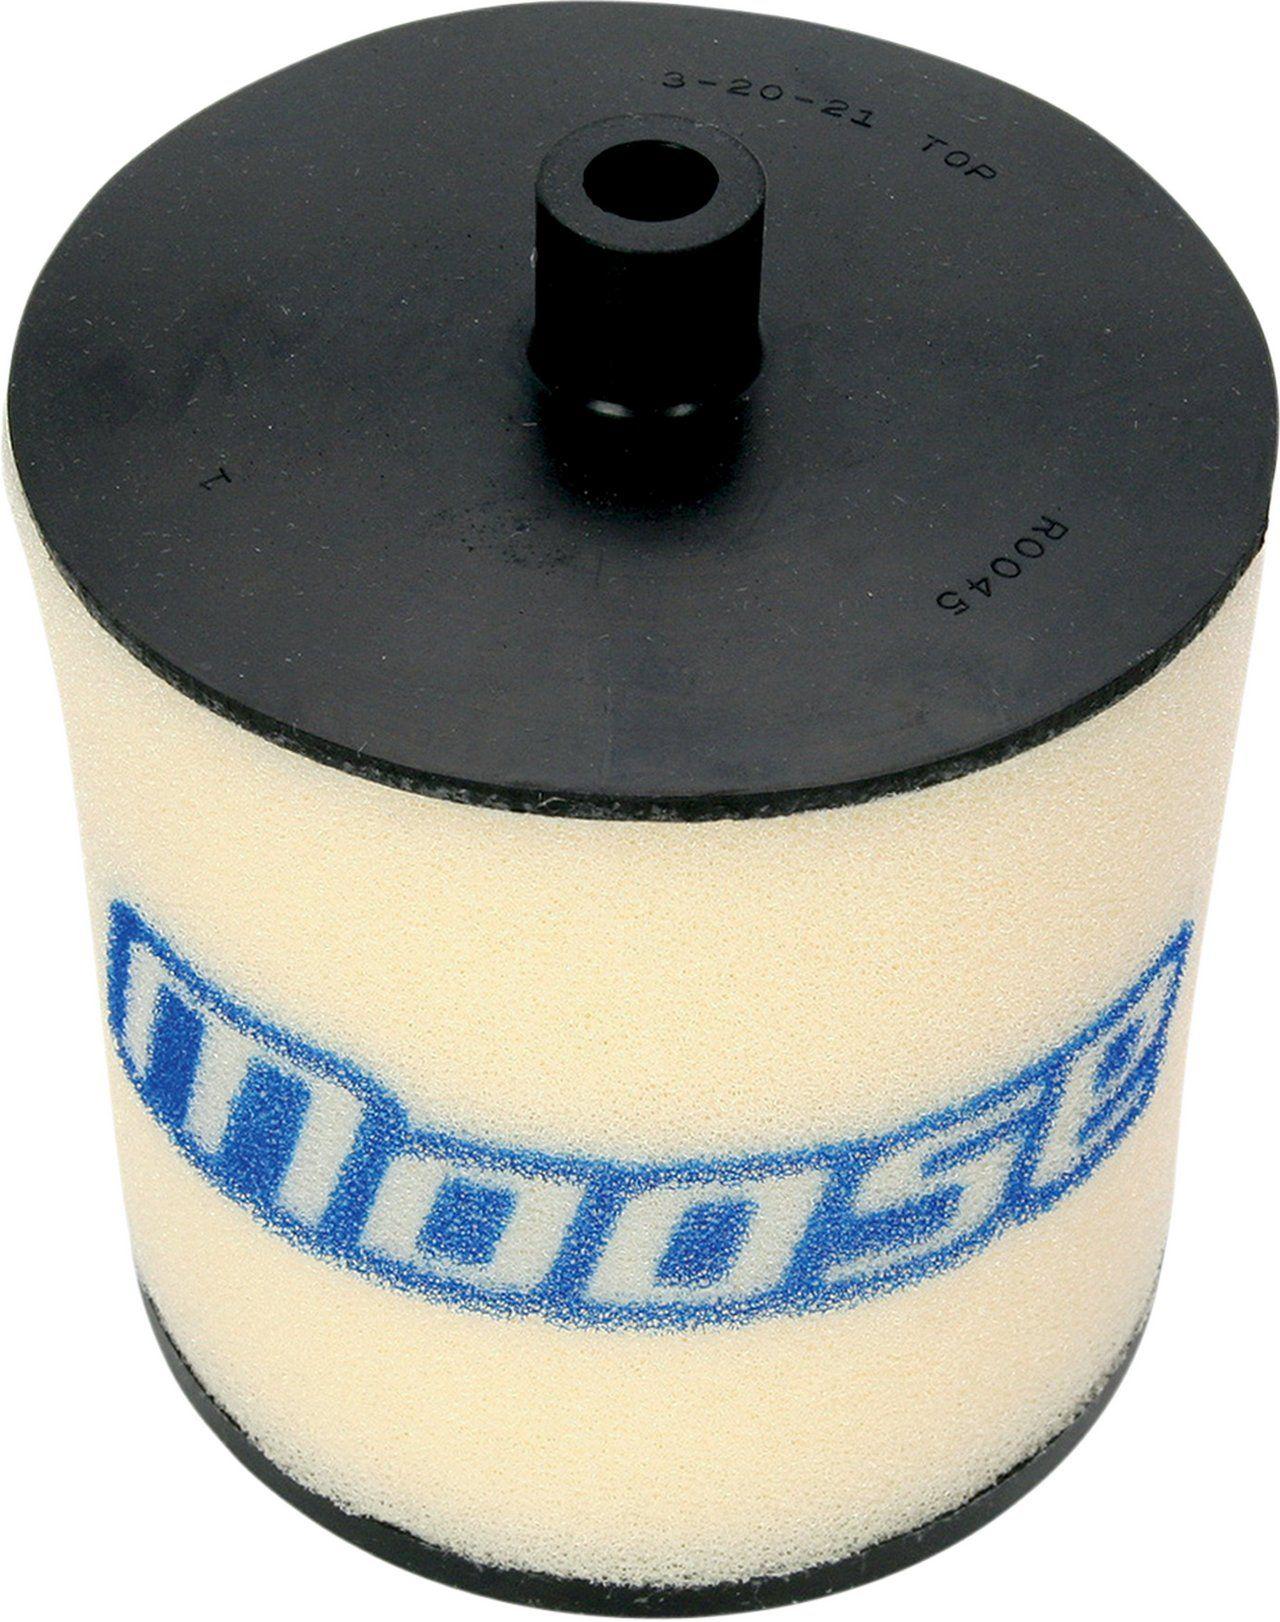 【MOOSE RACING】PPO (PRECISION PRE-OILED) 空氣濾芯 [M763-20-09] - 「Webike-摩托百貨」